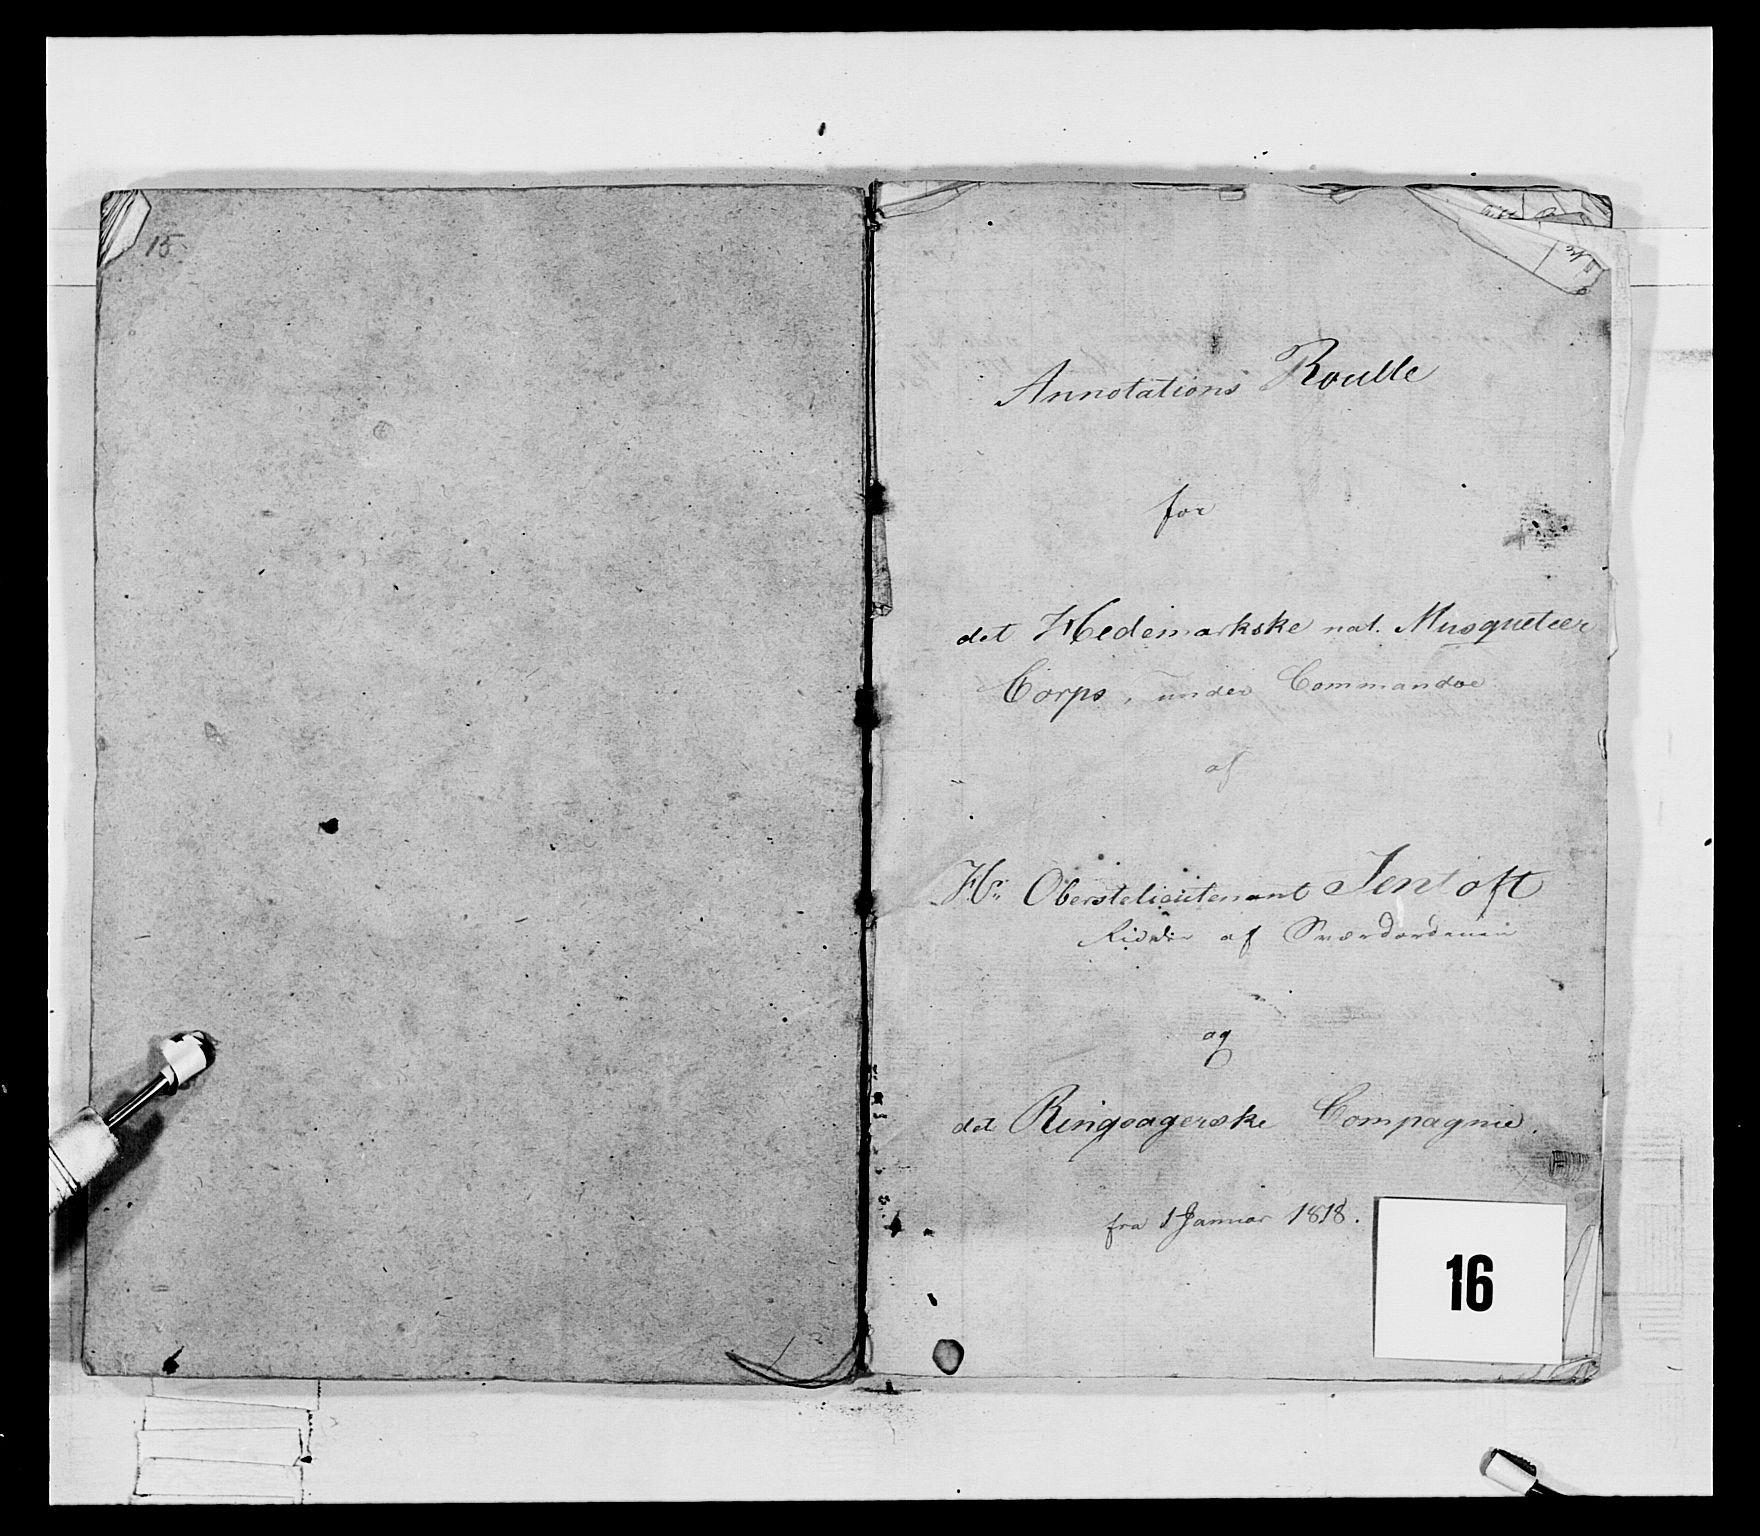 RA, Generalitets- og kommissariatskollegiet, Det kongelige norske kommissariatskollegium, E/Eh/L0069: Opplandske gevorbne infanteriregiment, 1810-1818, s. 746